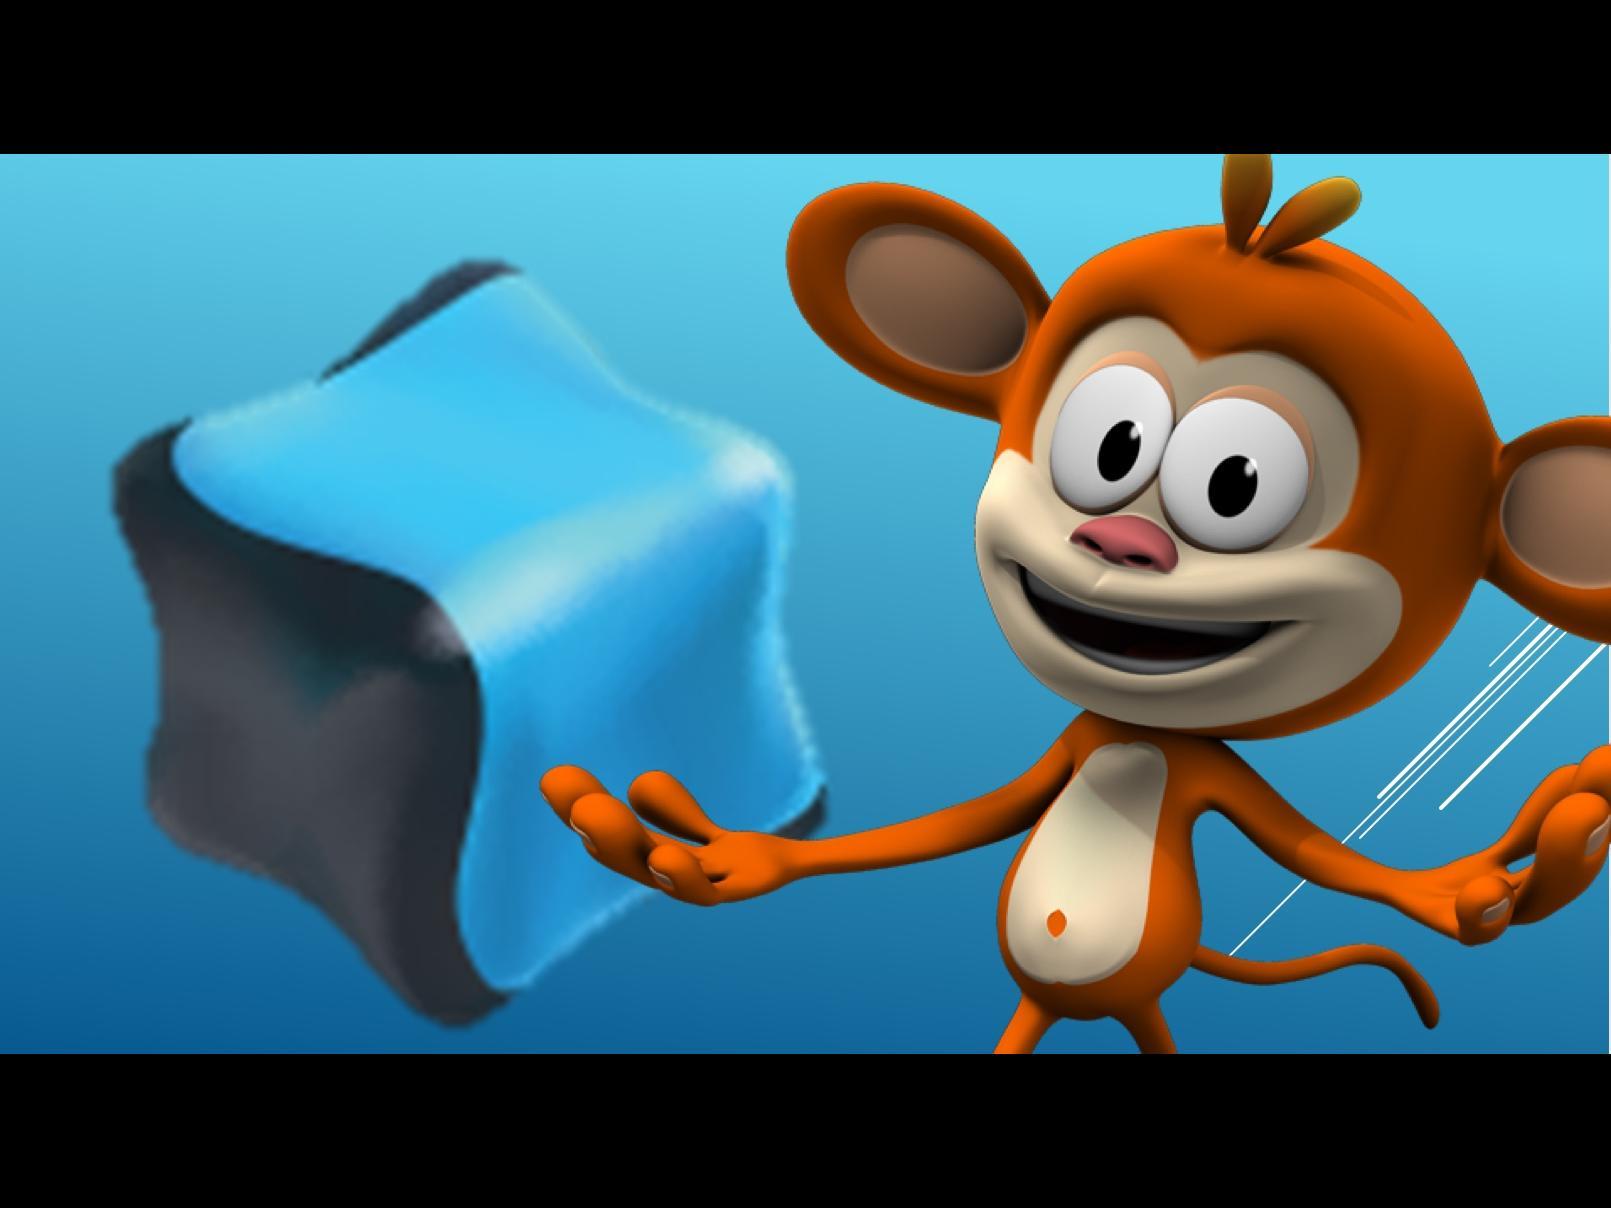 monkey see monkey do game instructions